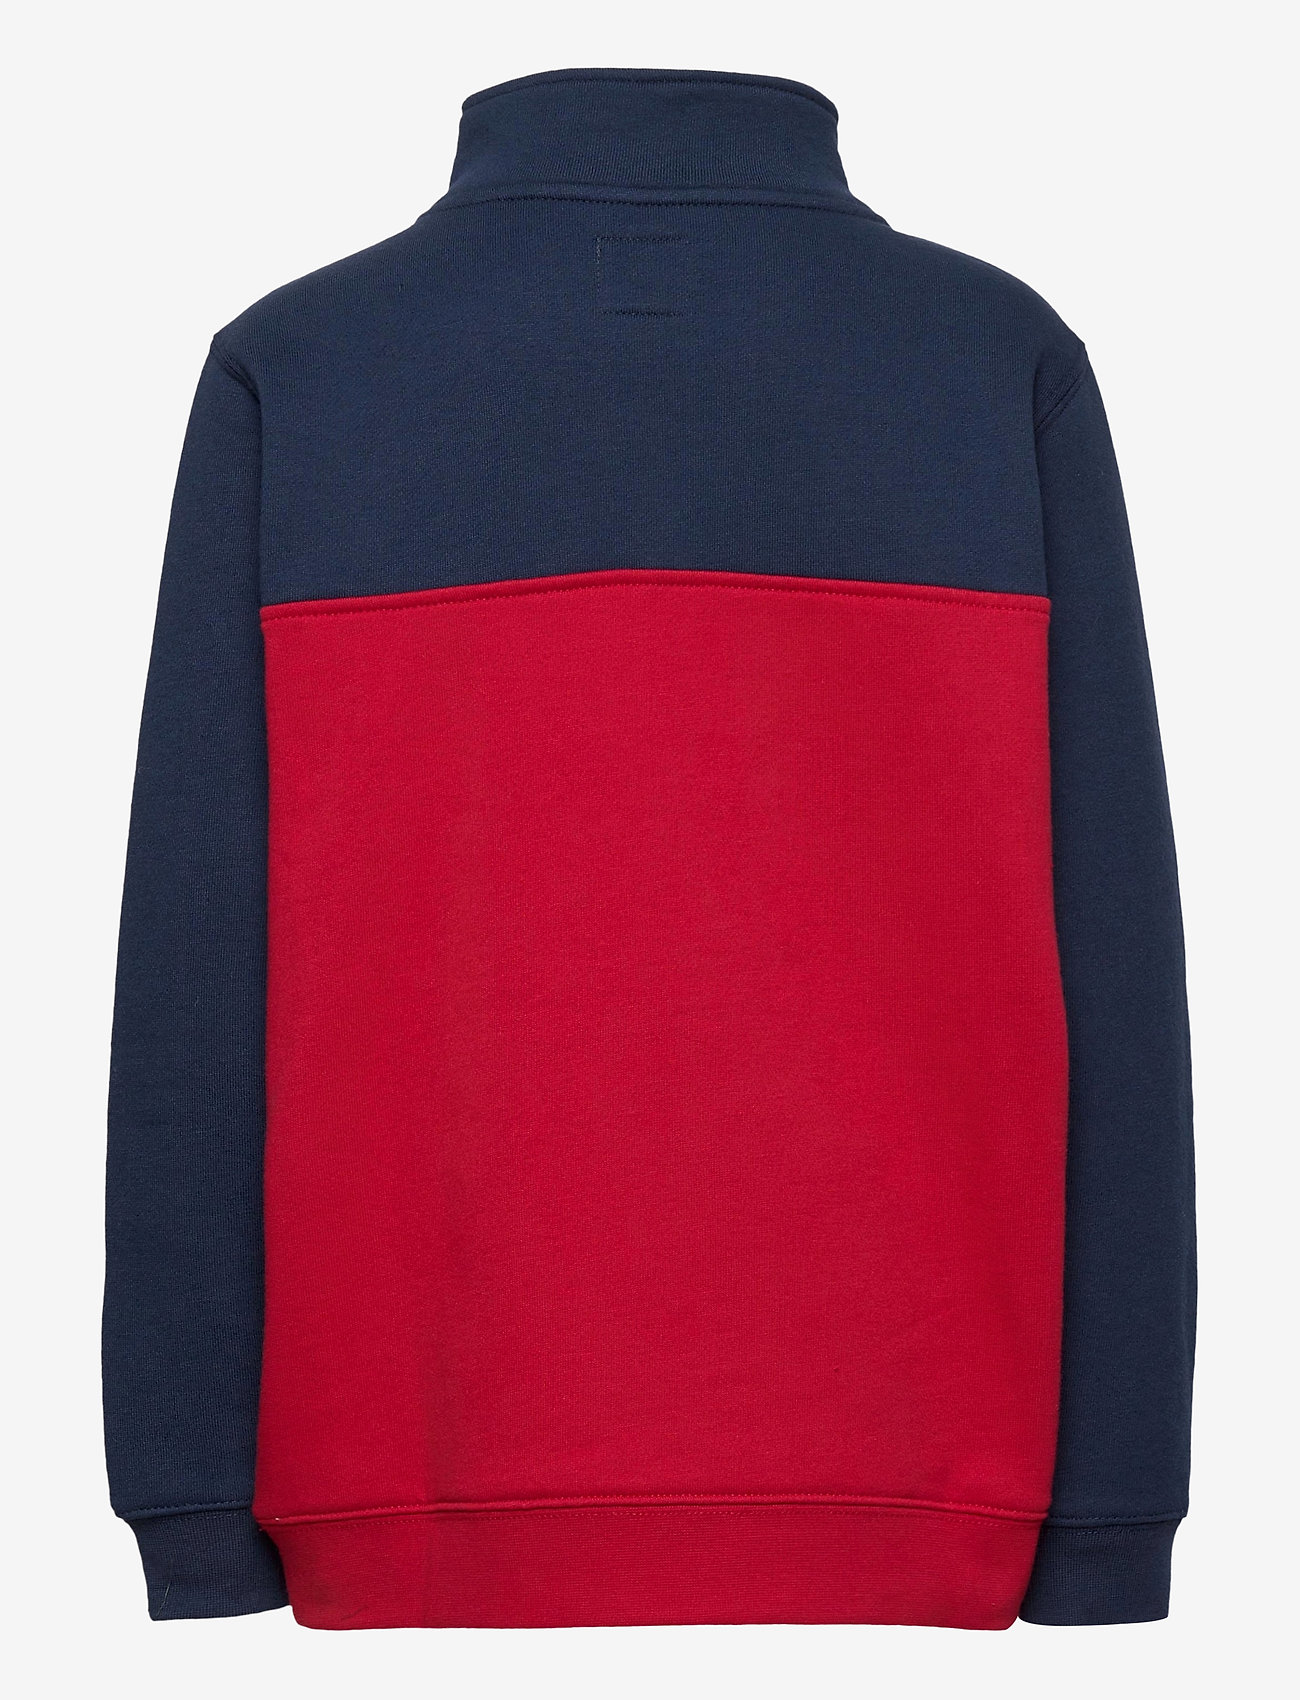 VANS - VICTORY 1/4 ZIP PO BOYS - sweatshirts - chili pepper - 1